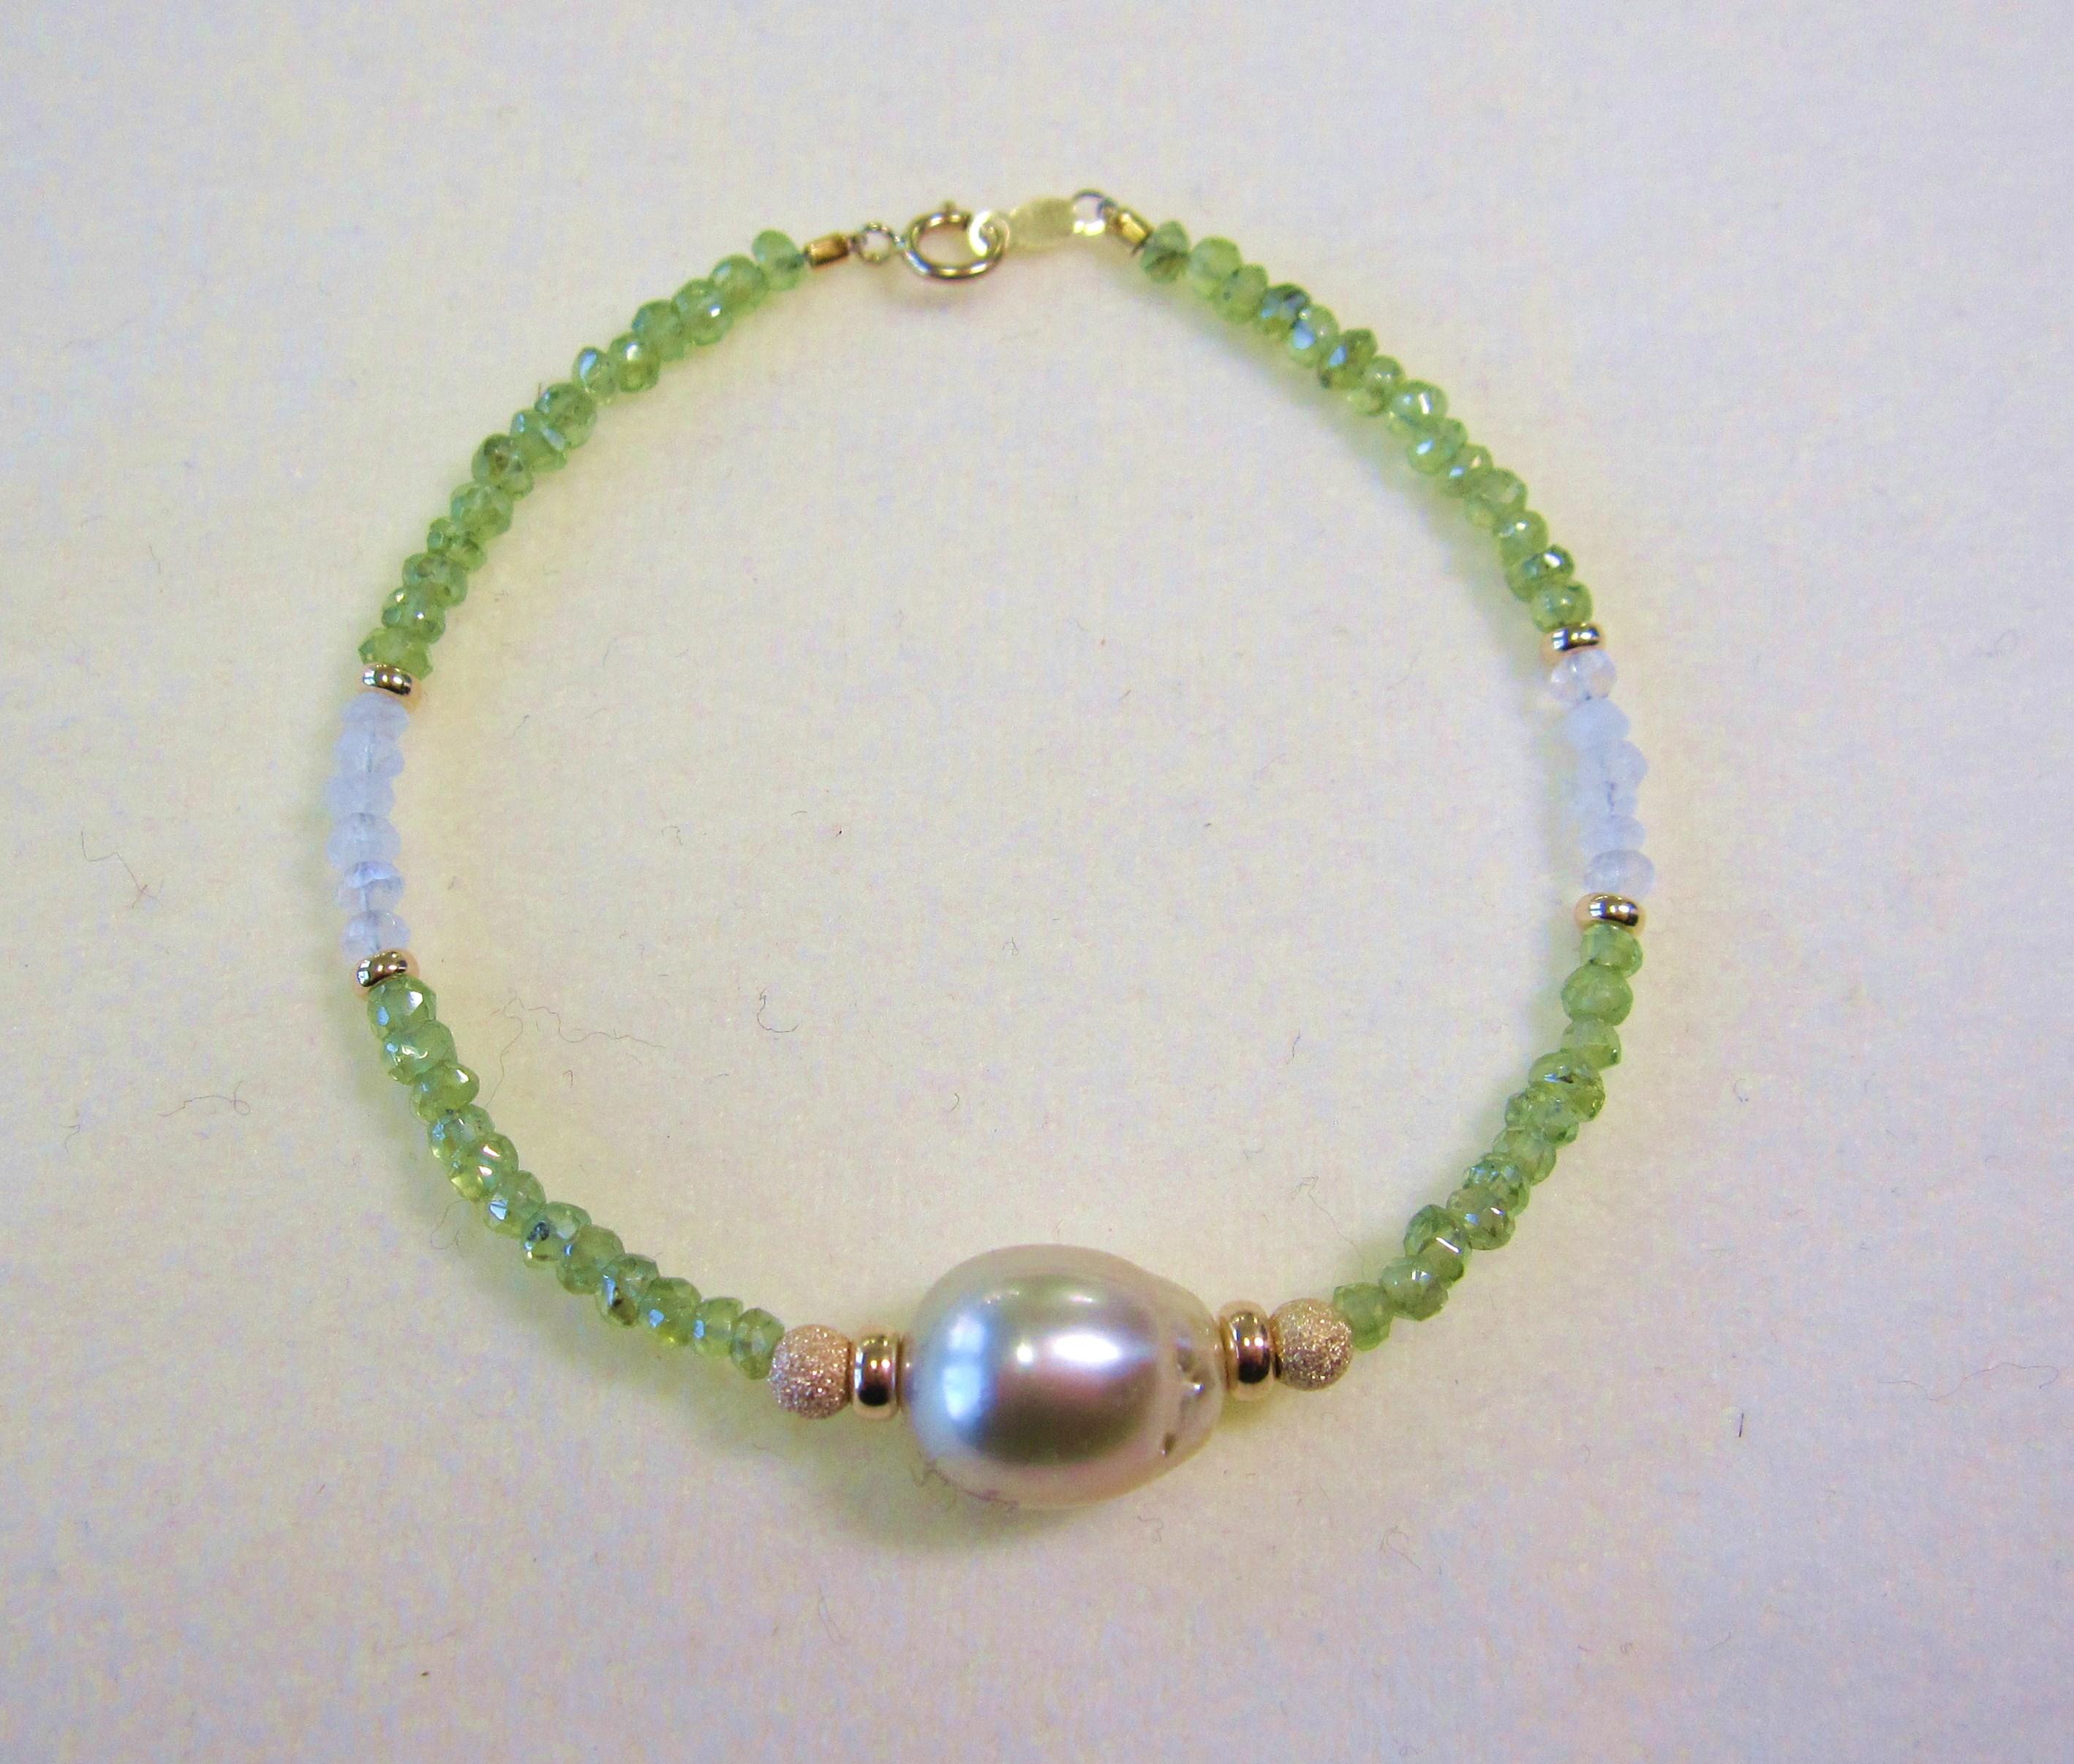 Creamy Golden South Sea pearl